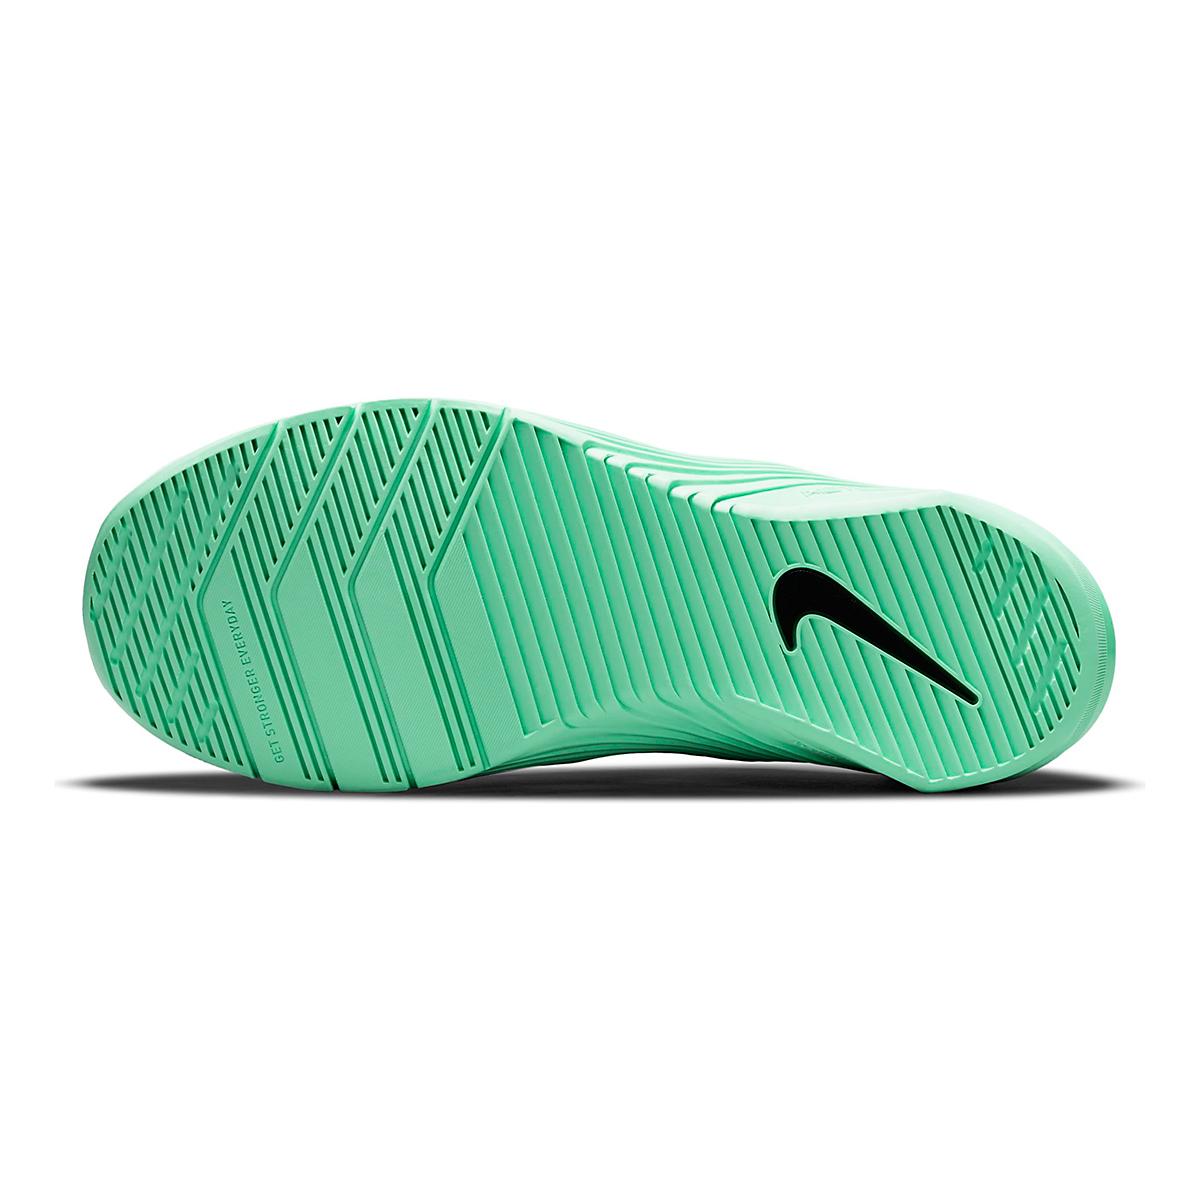 Women's Nike Metcon 6 Training Shoe - Color: White/Smoke Grey/Infinite Lilac - Size: 5 - Width: Regular, White/Smoke Grey/Infinite Lilac, large, image 3